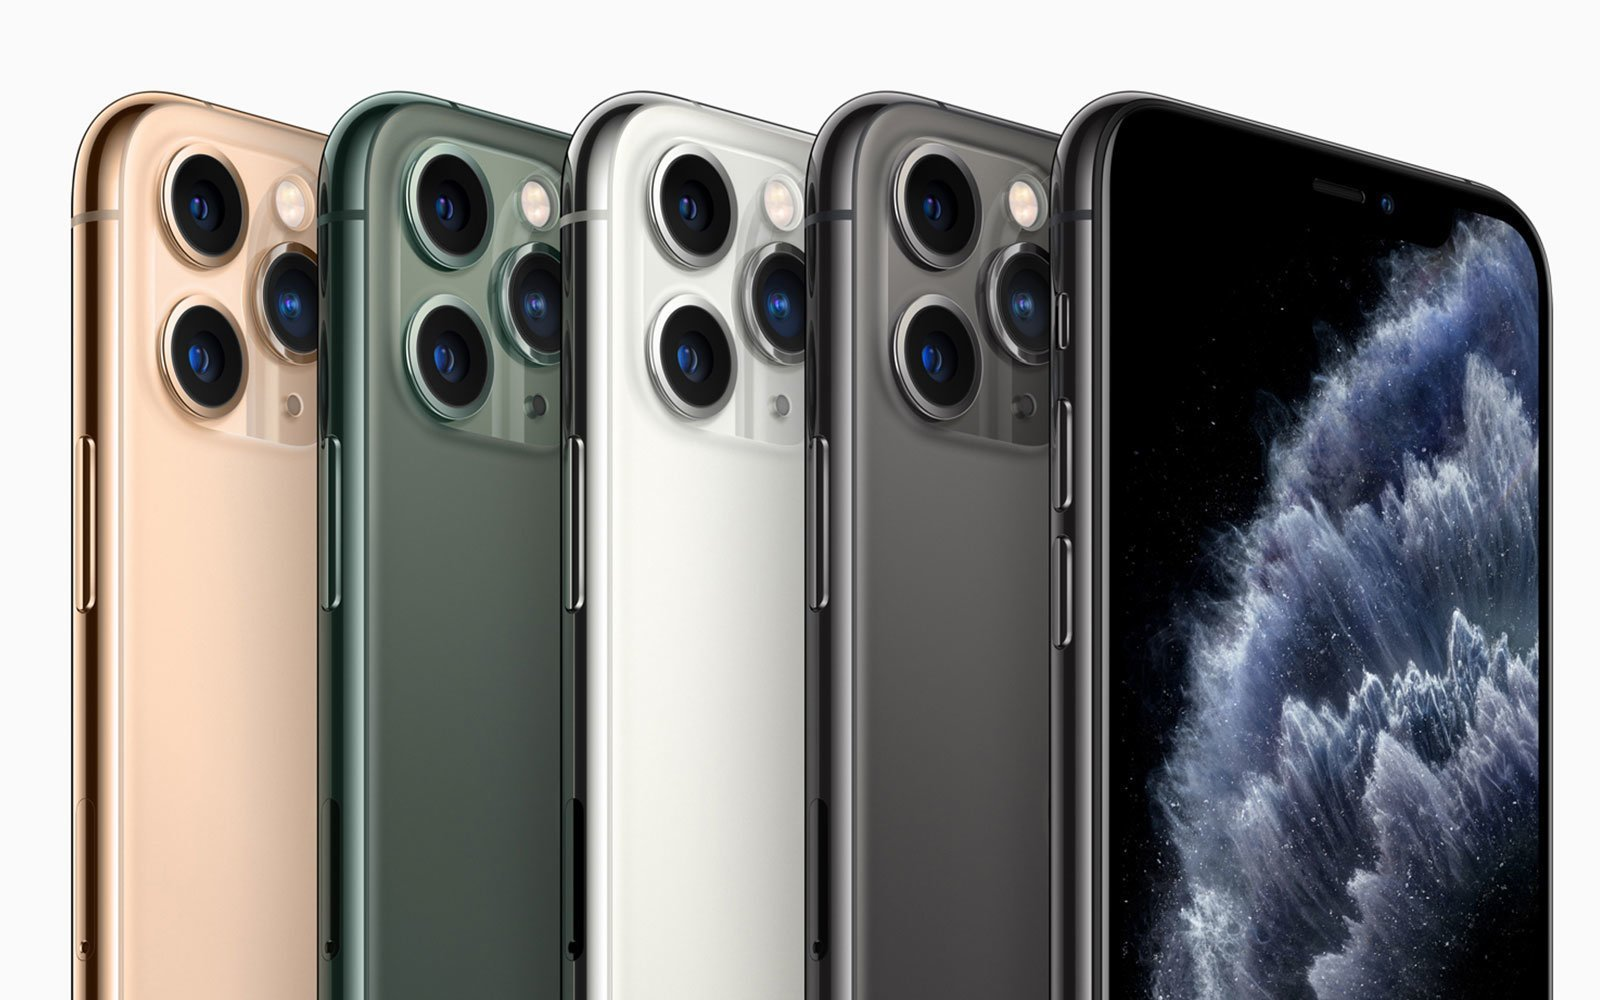 iPhone 11, iPhone XR и iPhone 8_какой из iphone выбрать - камеры и дисплей iPhone 11 Pro Max